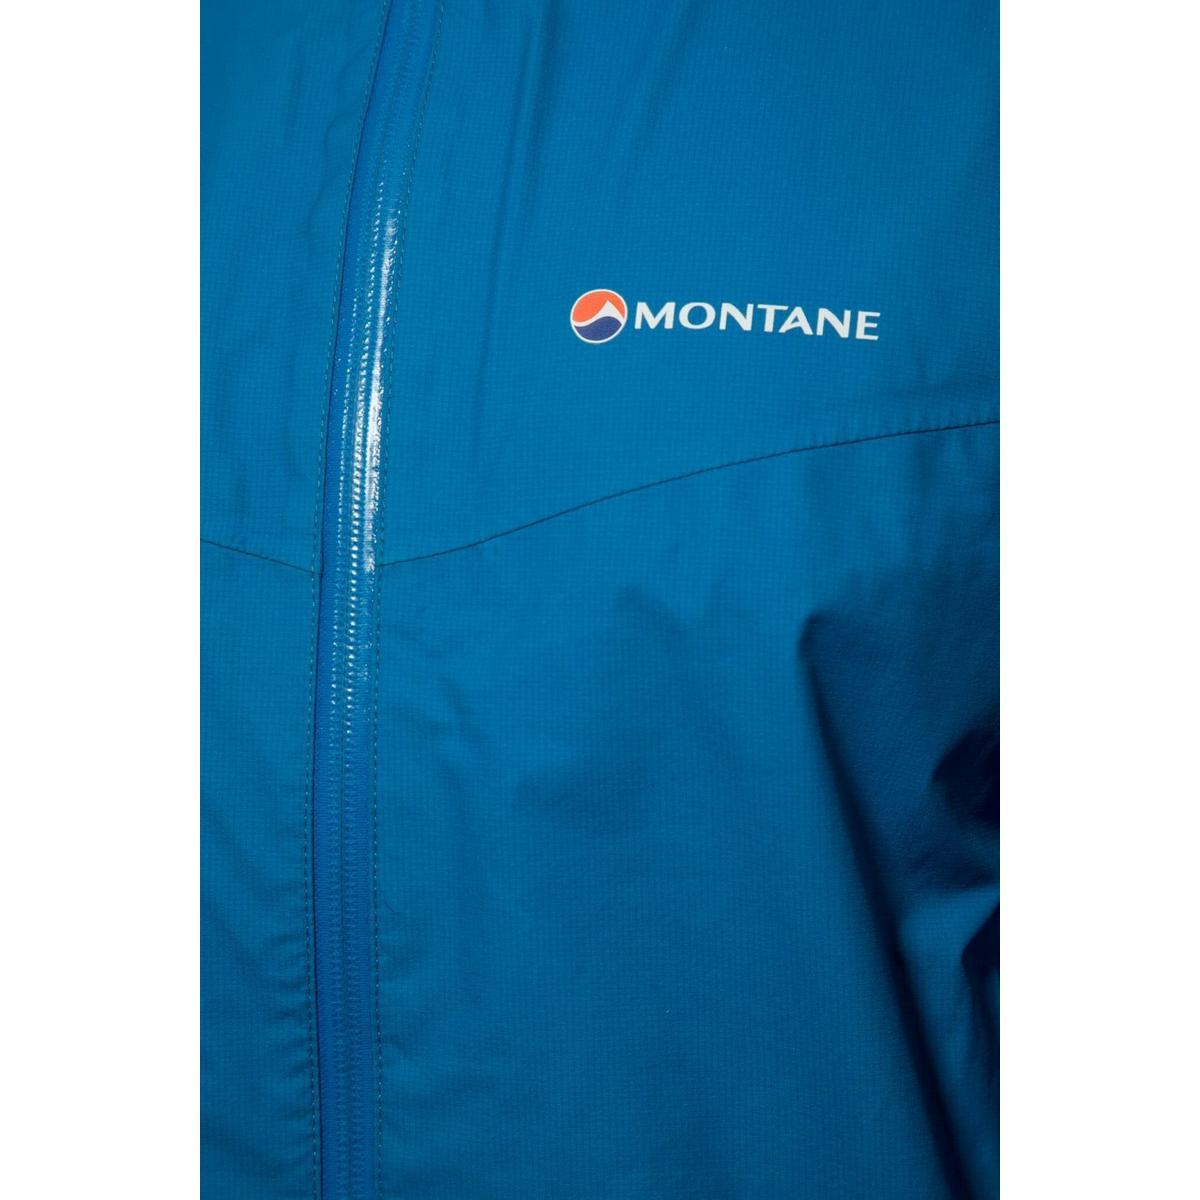 Montane Men's Montane Pac Plus Waterproof Jacket - Blue